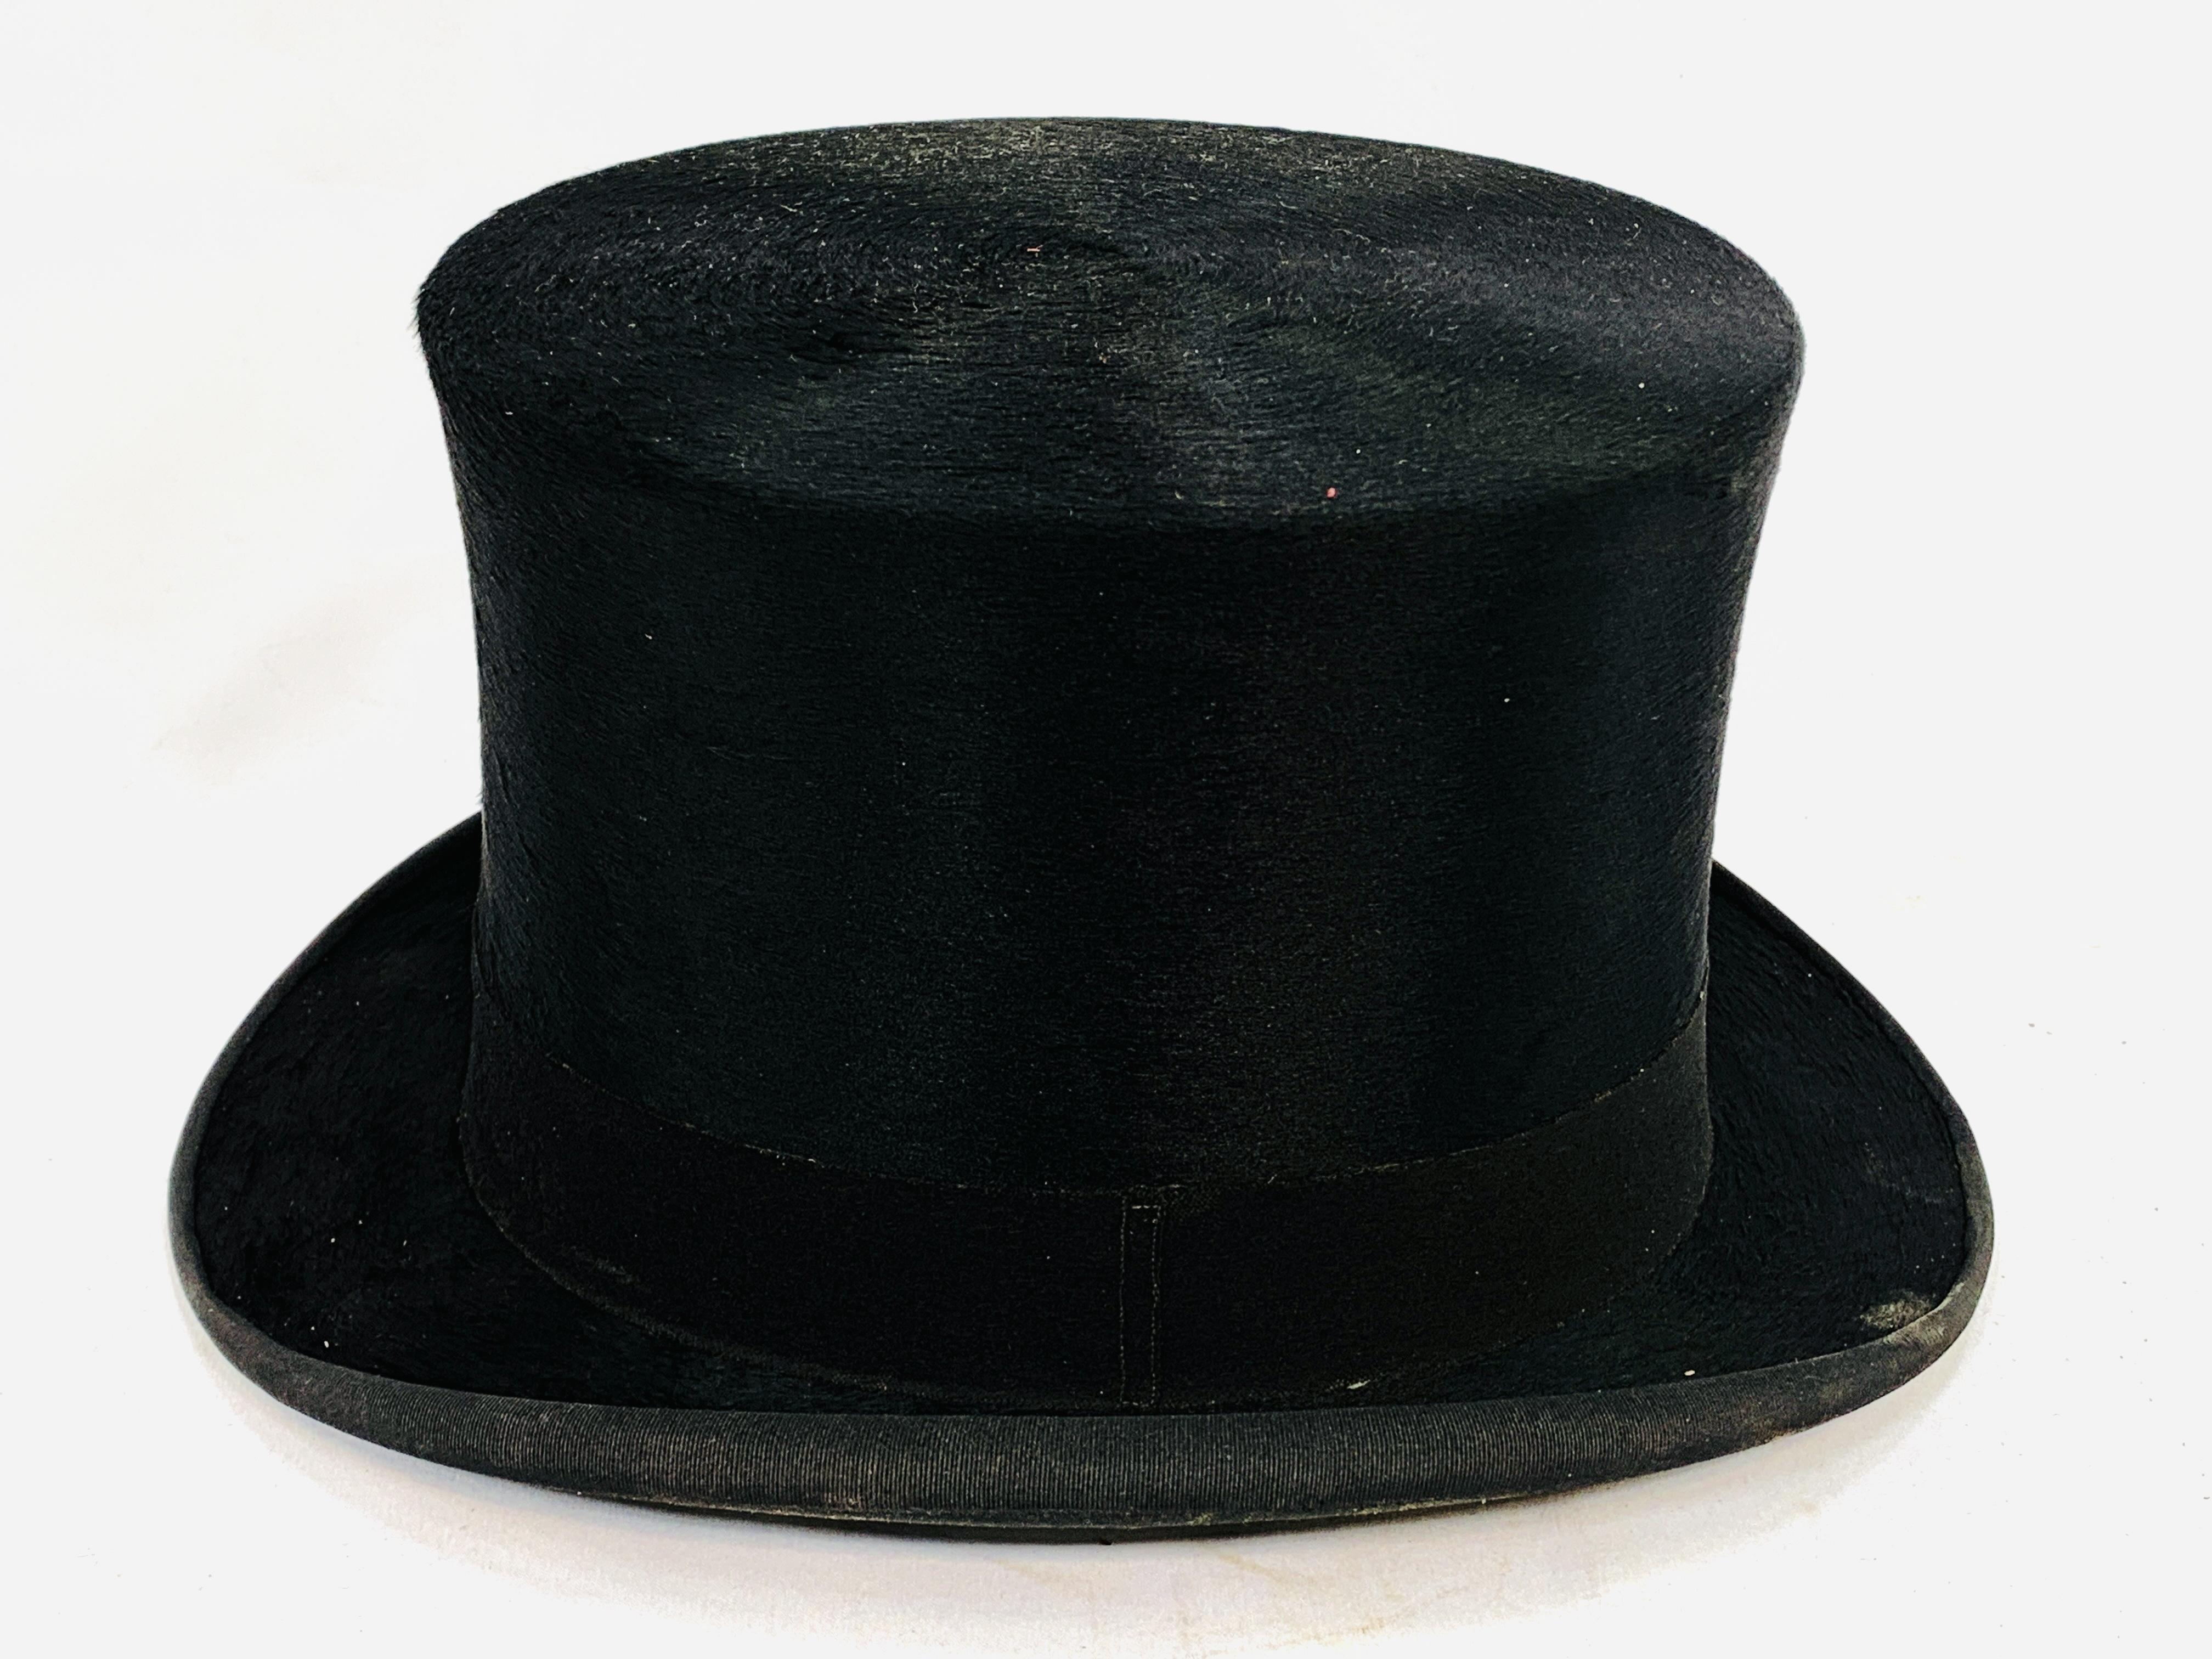 Black silk top hat by City Cork Hat Company Ltd - Image 3 of 3